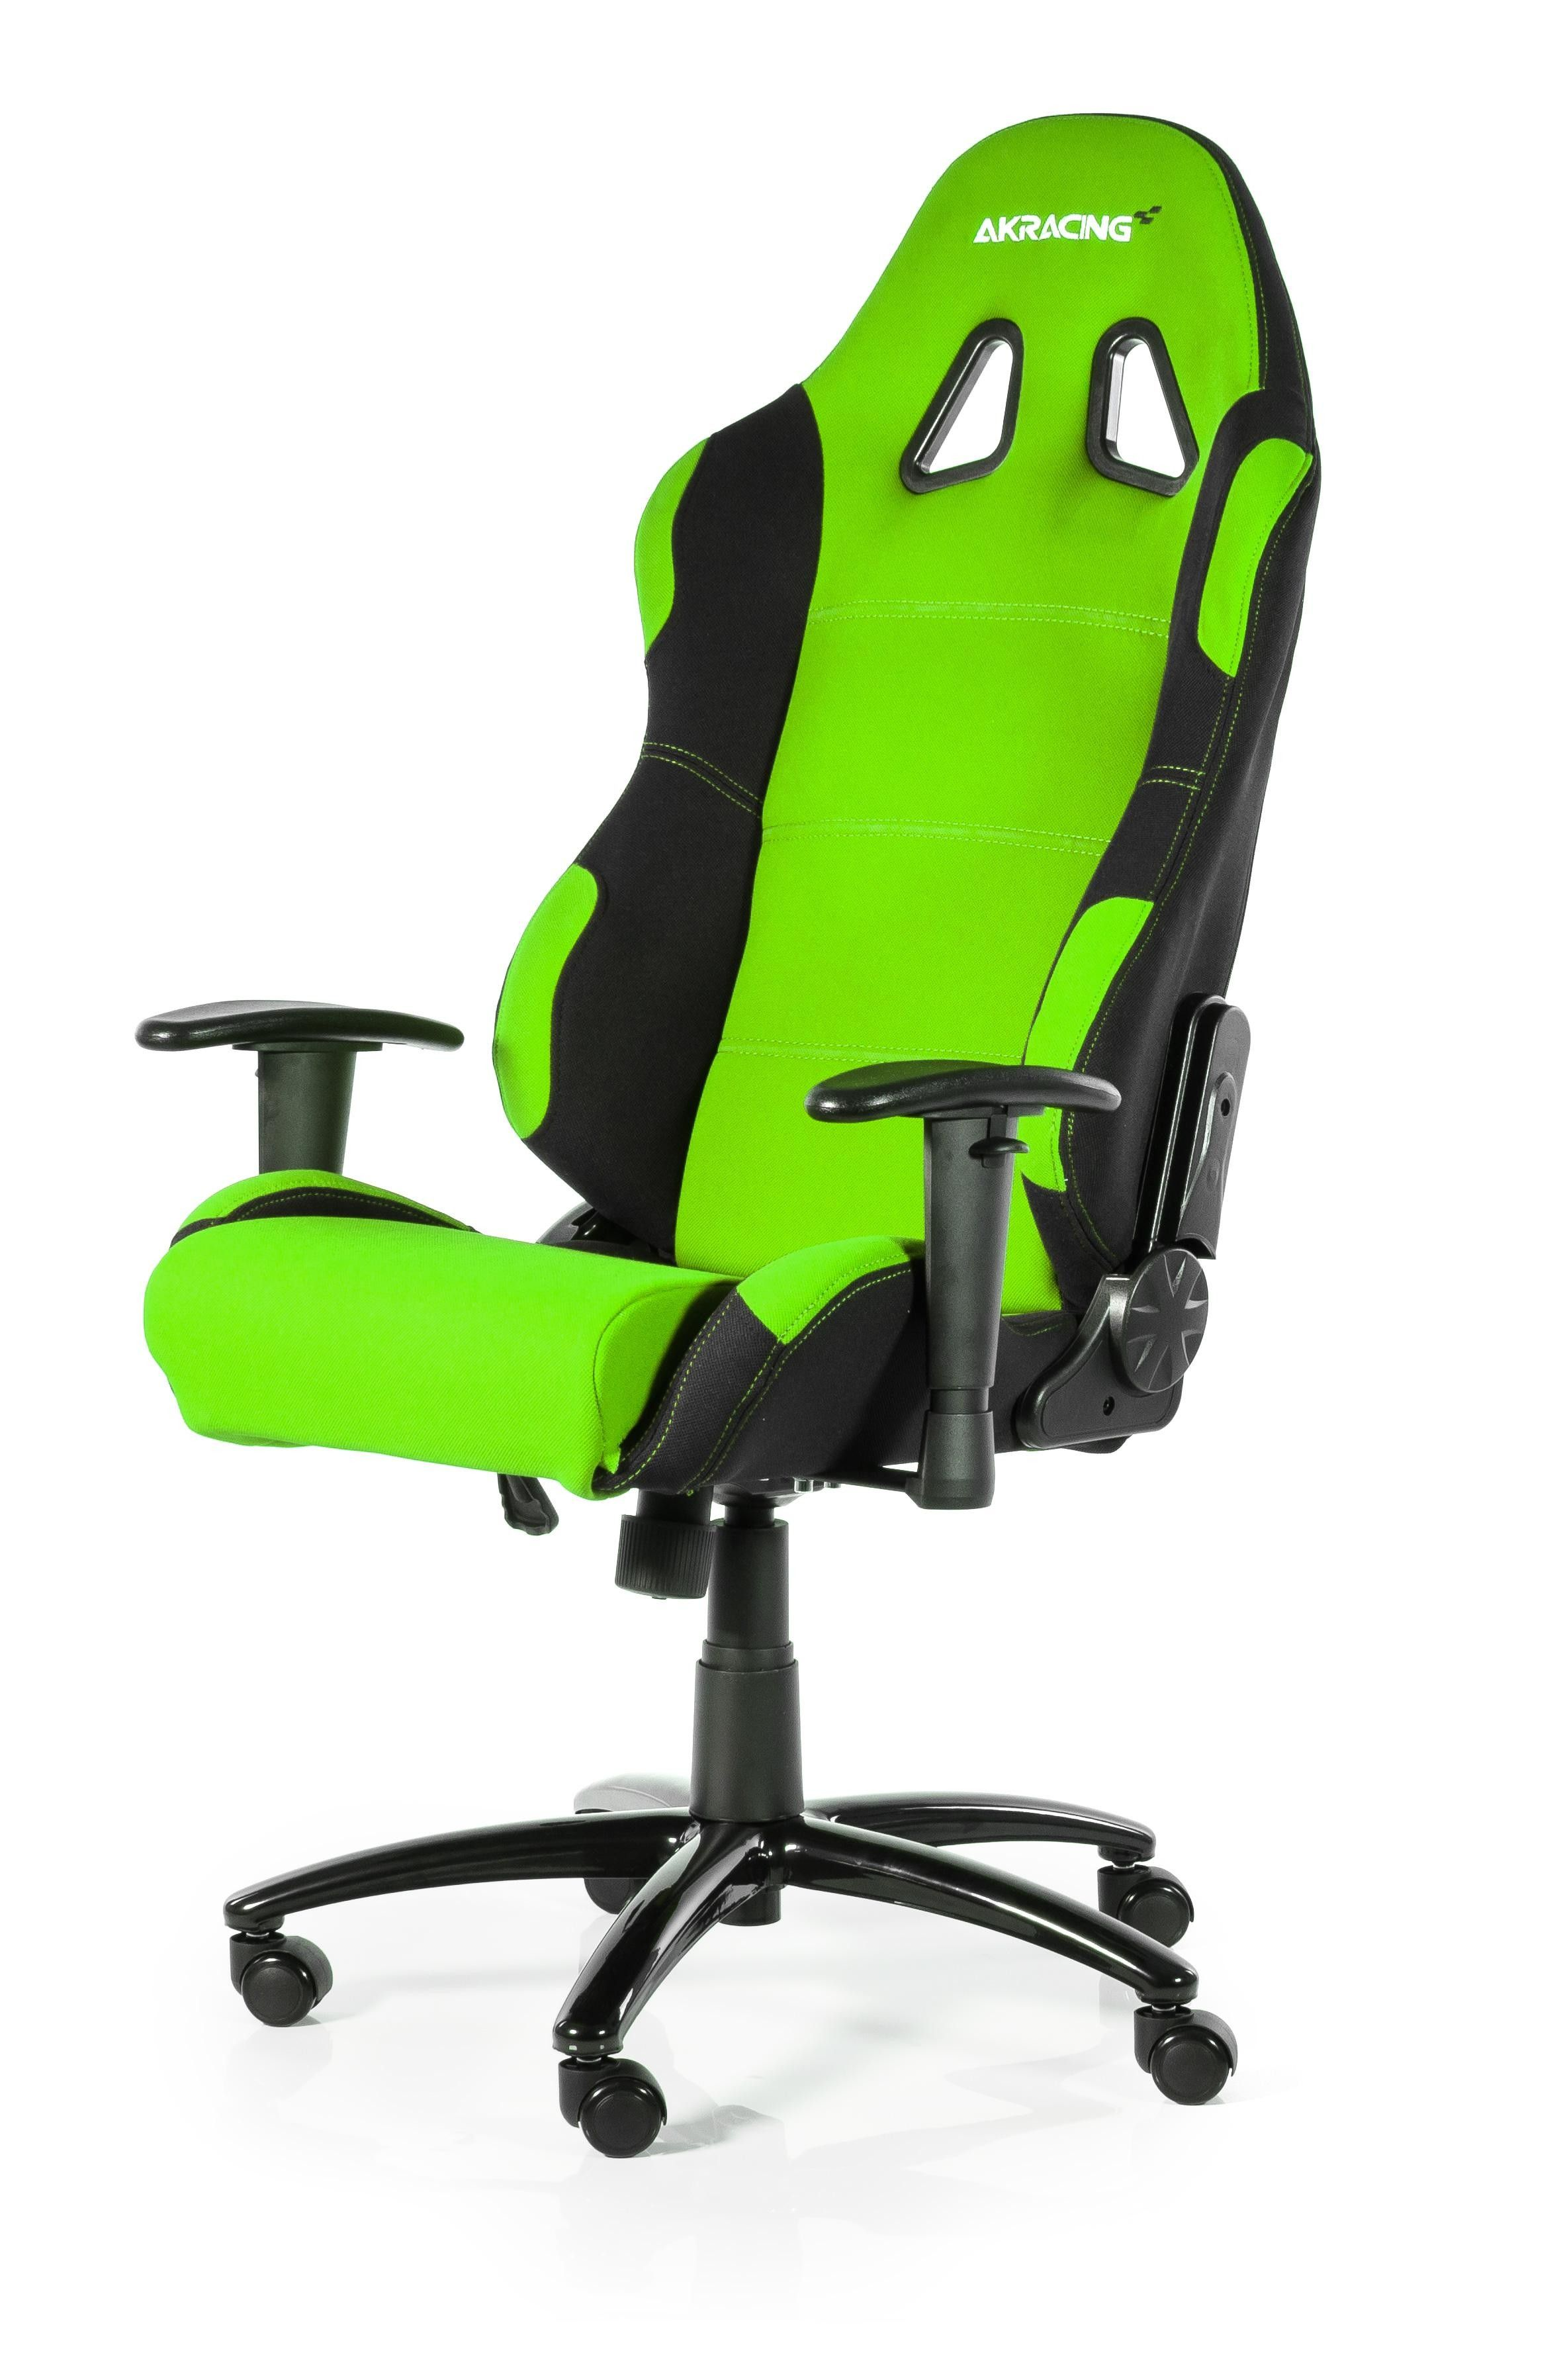 AKRACING Prime Gaming Chair Black Green WRGamers AKRacing